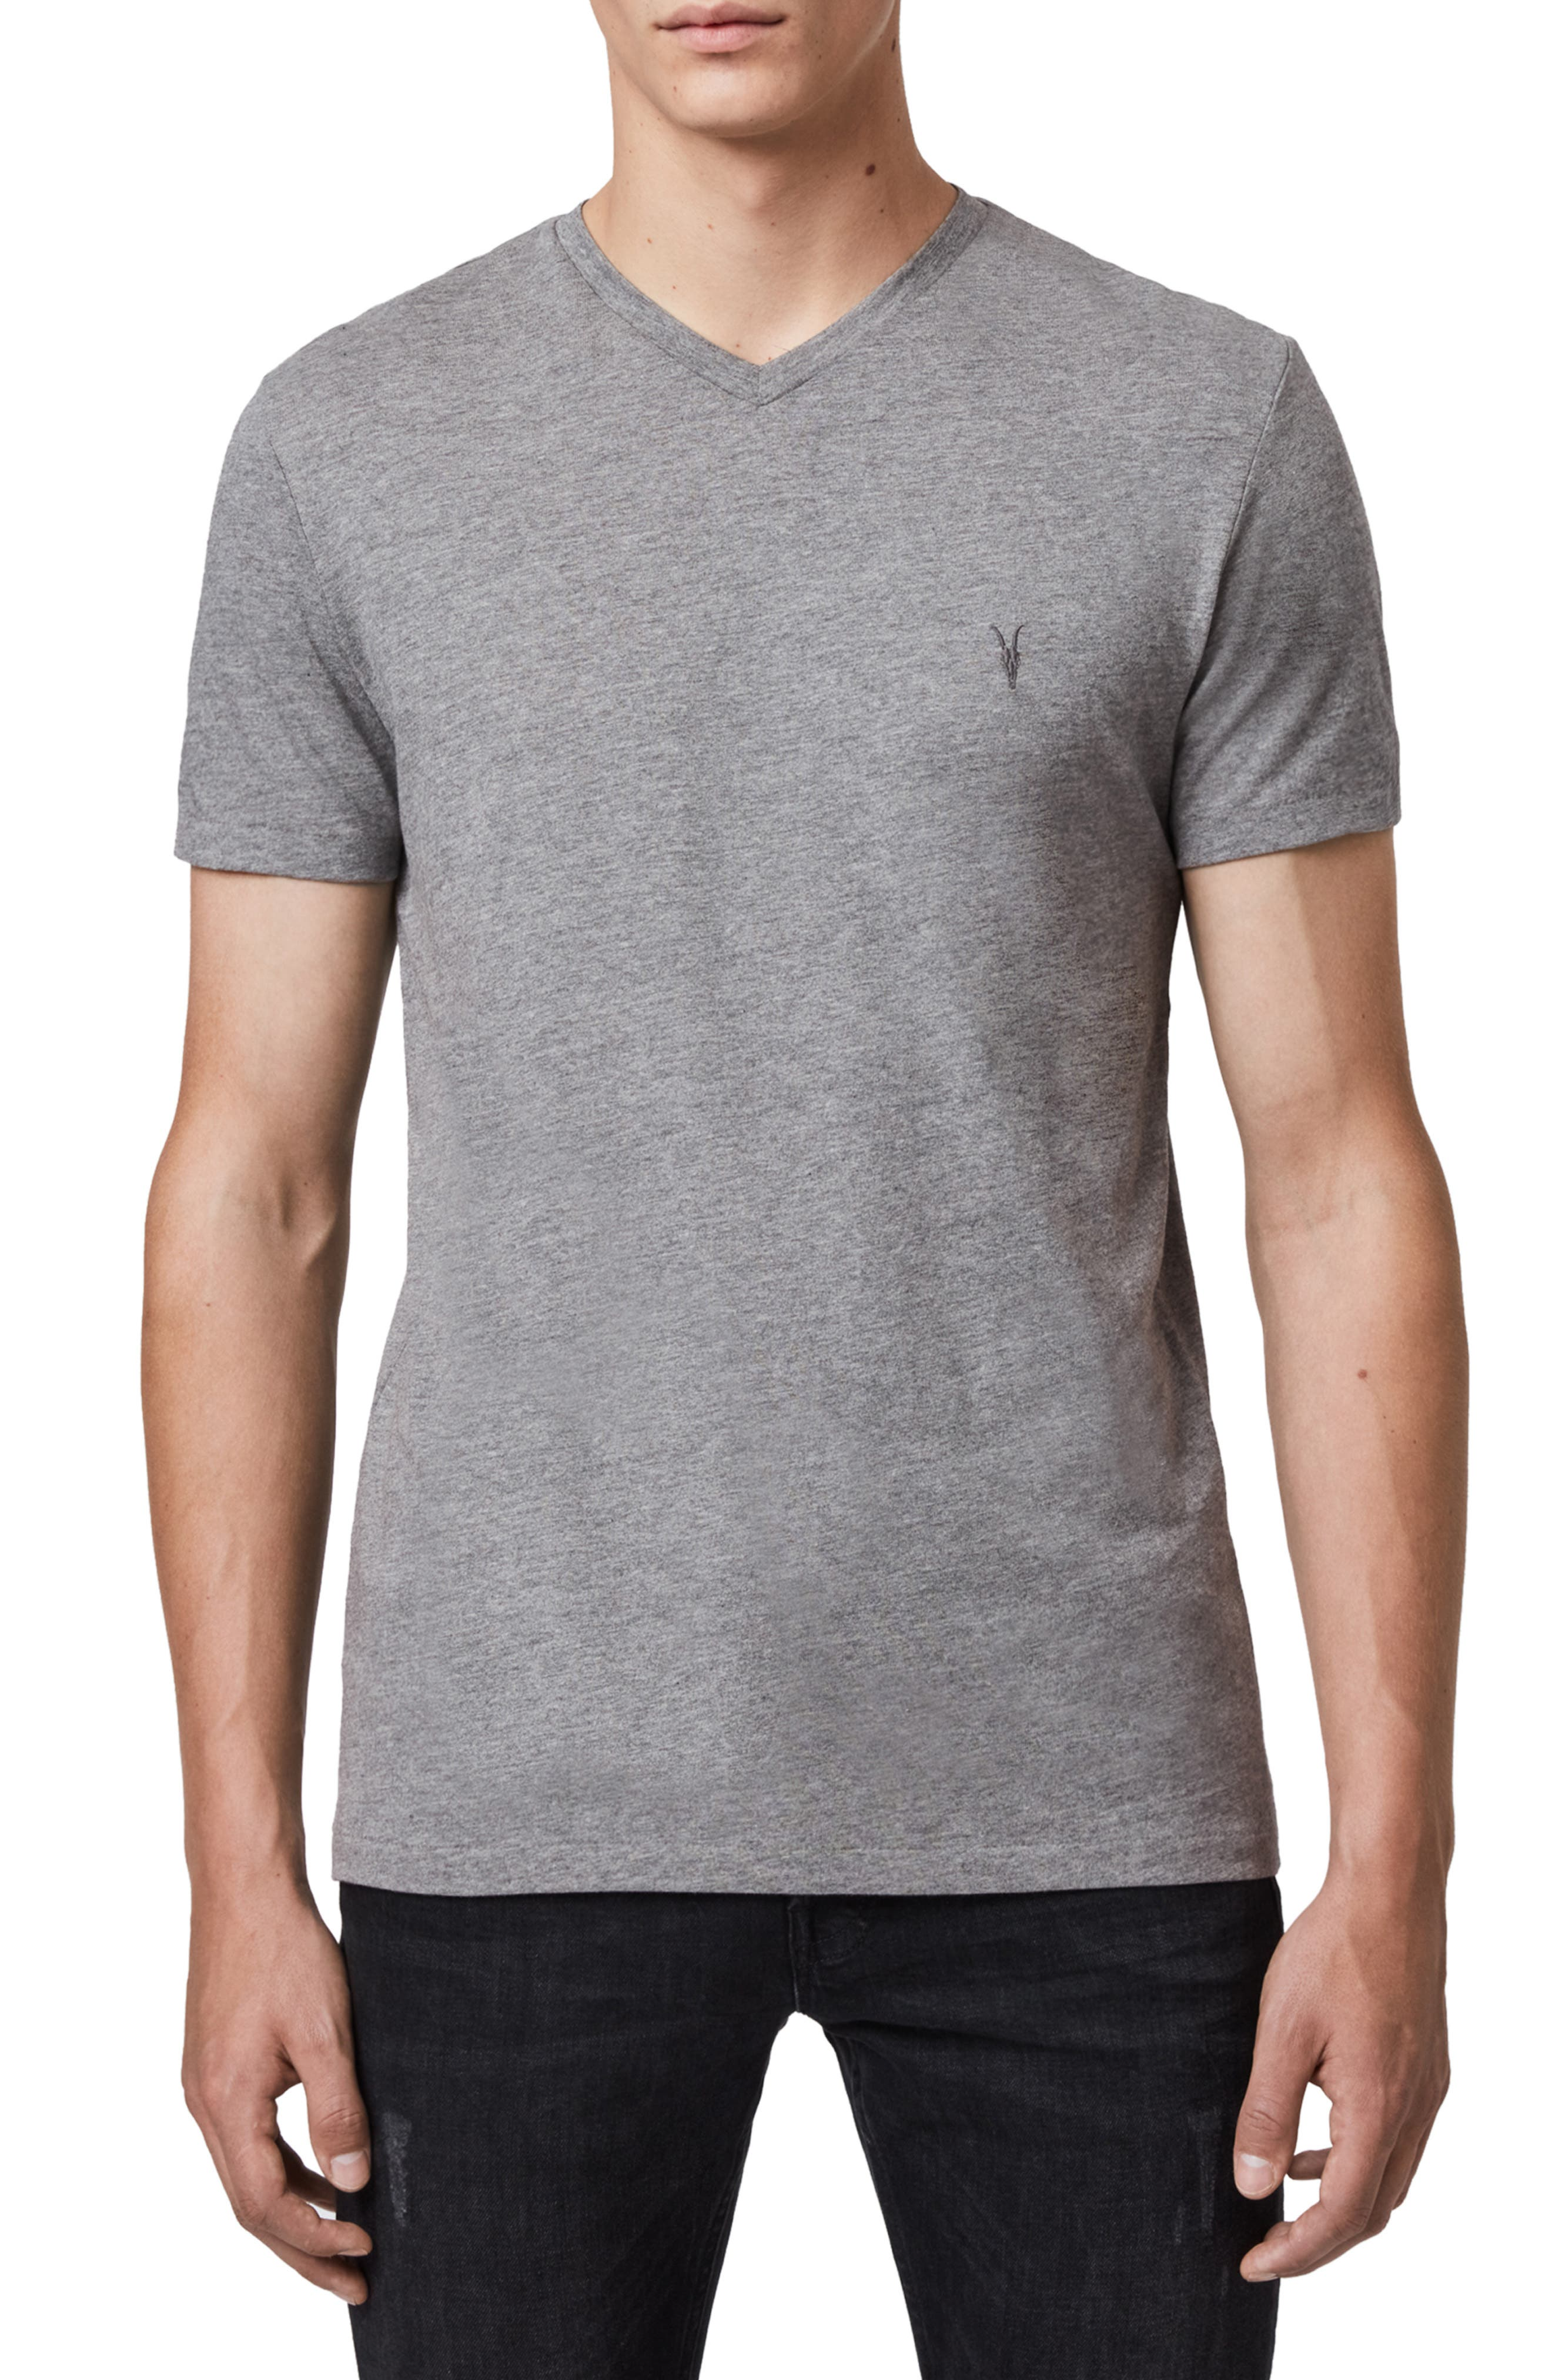 Image of ALLSAINTS Tonic V-Neck Shirt